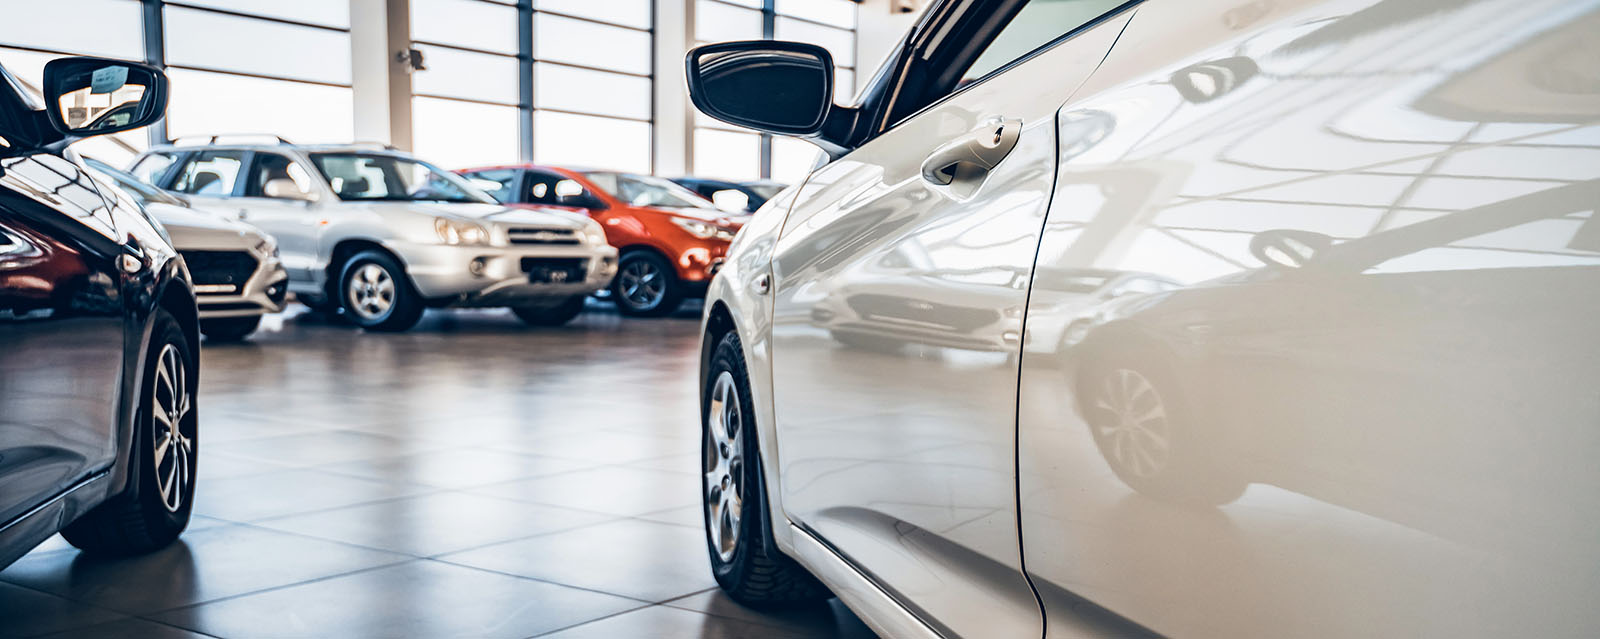 Kontakta Haninge Bilpark när du ska sälja bil i Stockholm